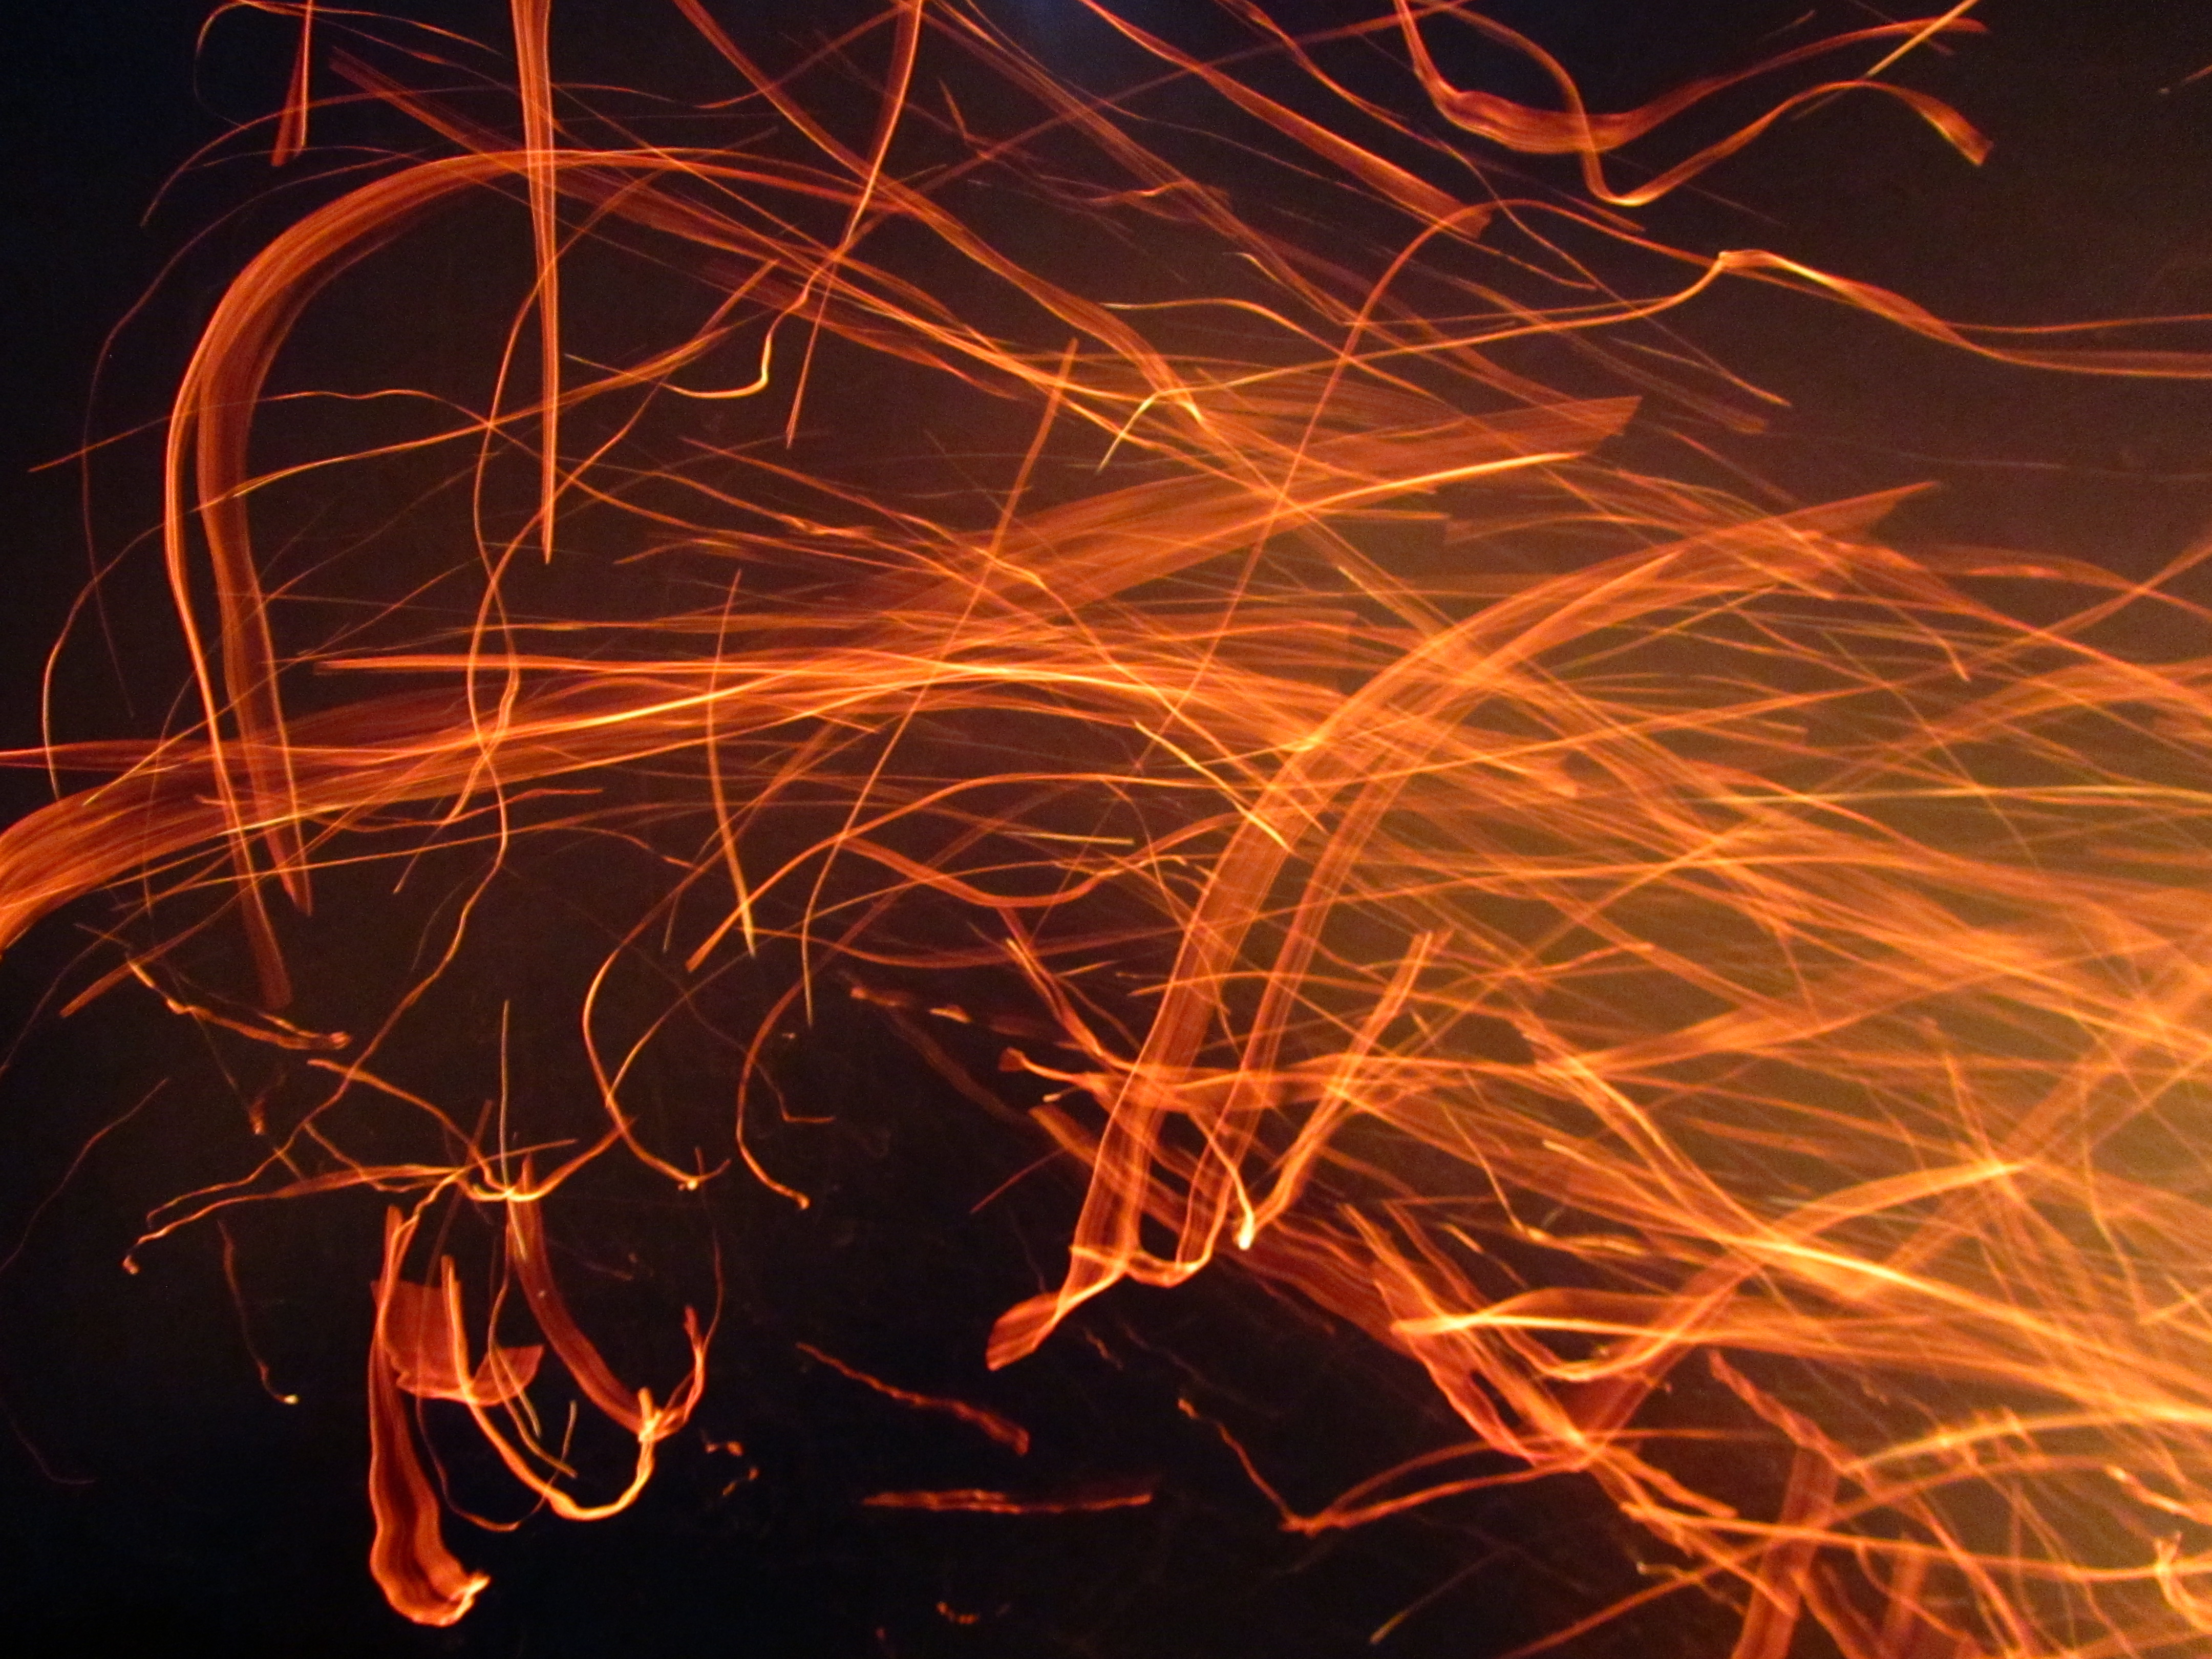 Feuer 4k Ultra HD Wallpaper And Hintergrund 4320x3240